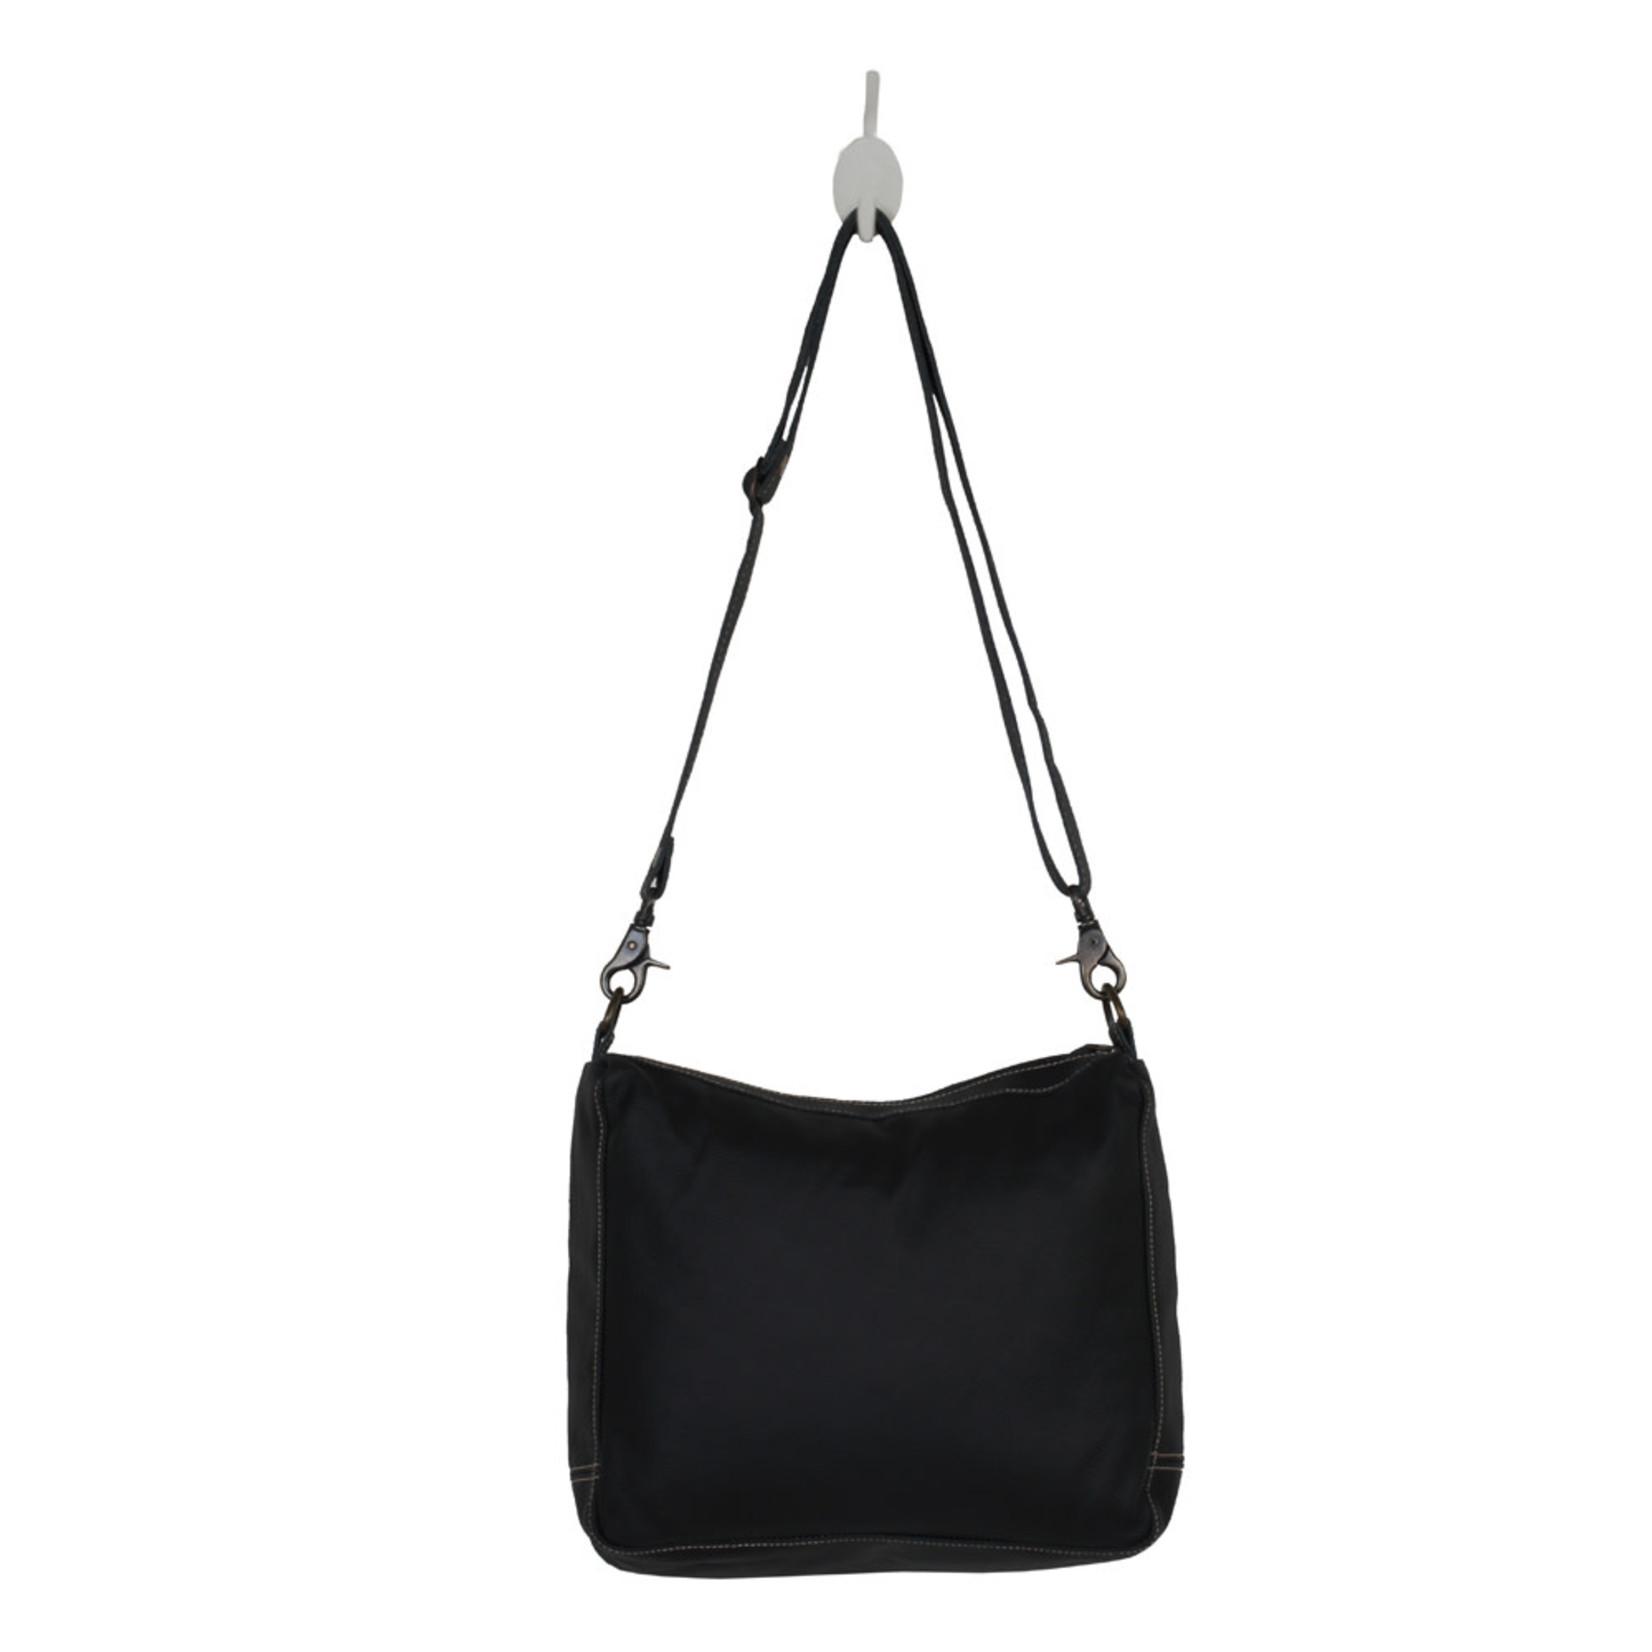 Myra Bags S-2572 Monochromatic Magic Bag